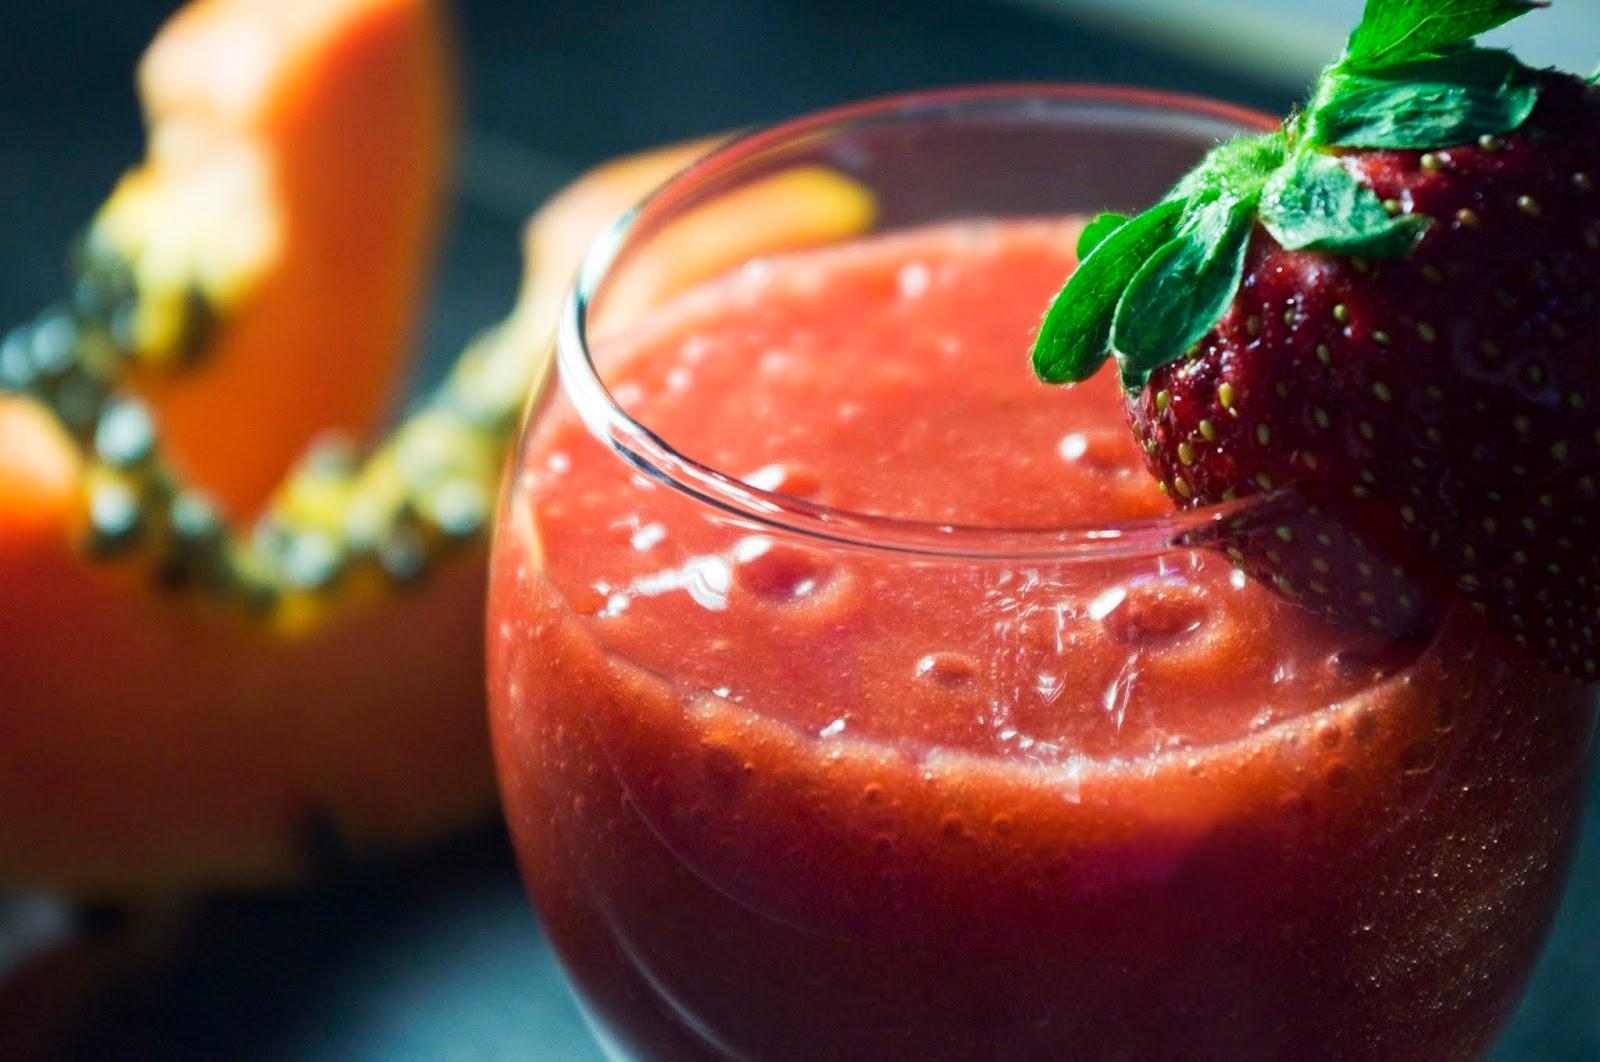 Smothie de papaya y fresas